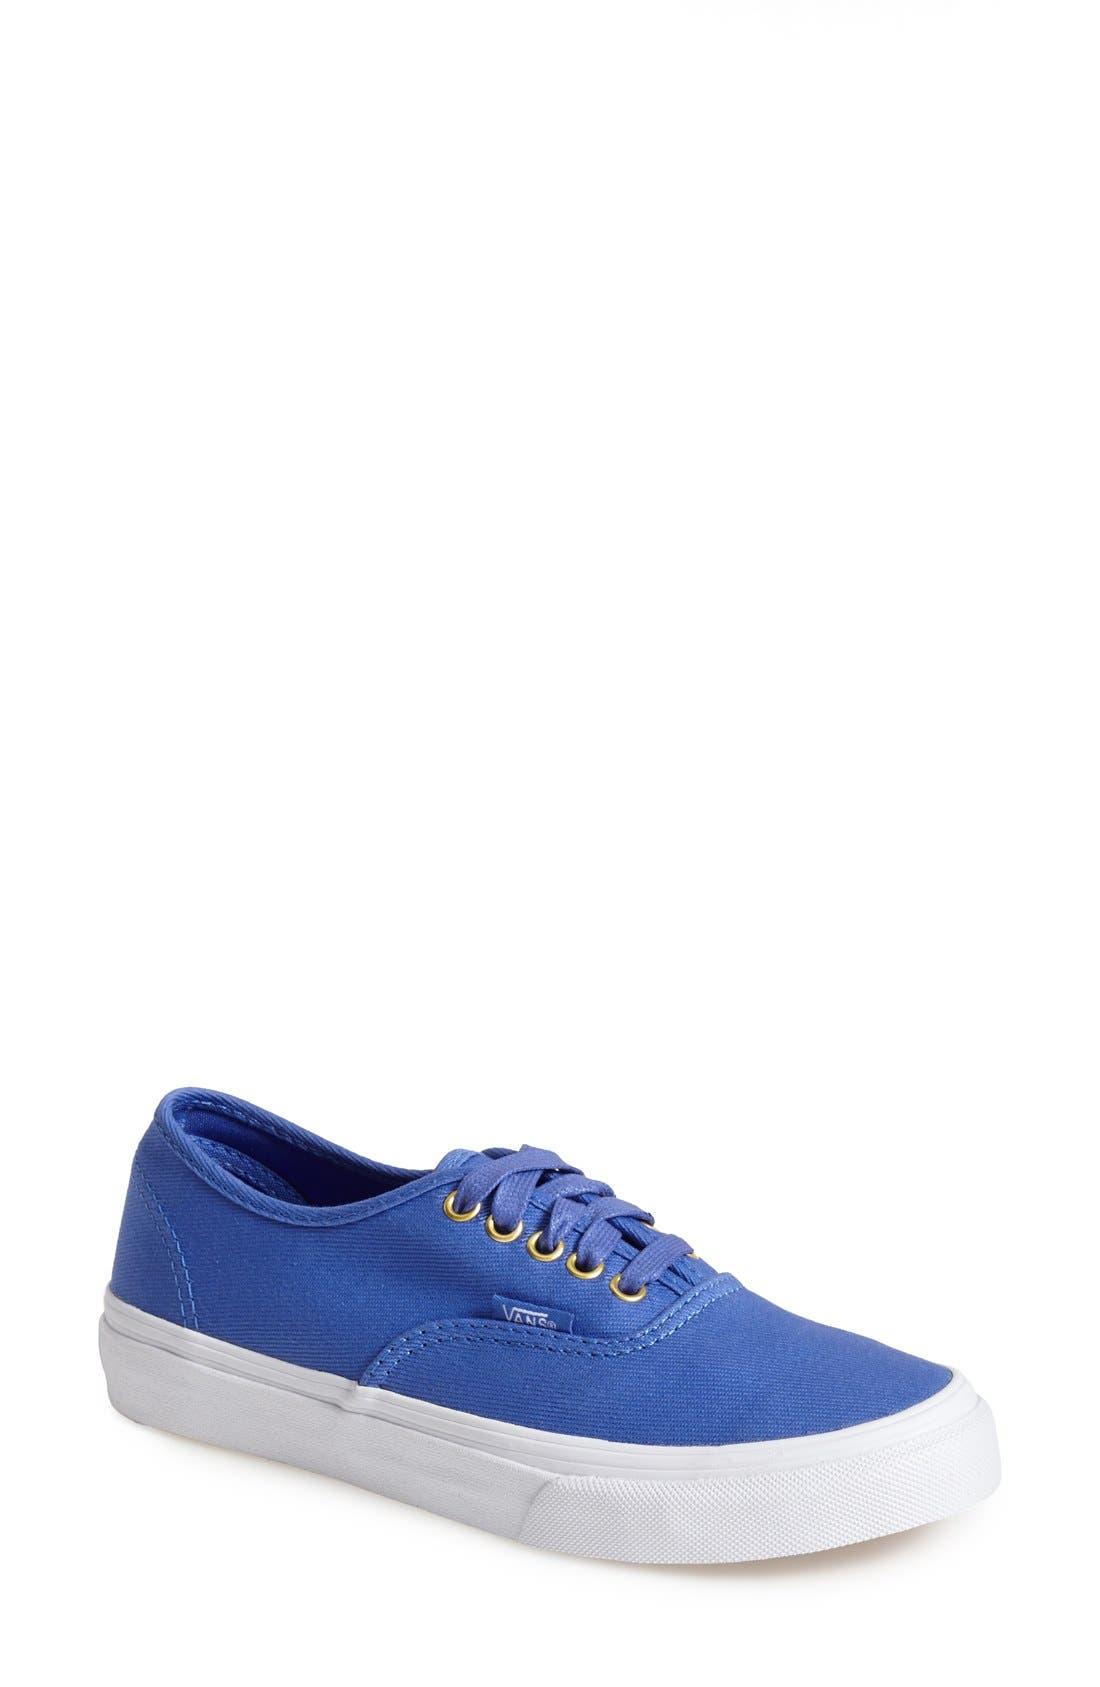 Alternate Image 1 Selected - Vans 'Authentic Slim' Twill Sneaker (Women)